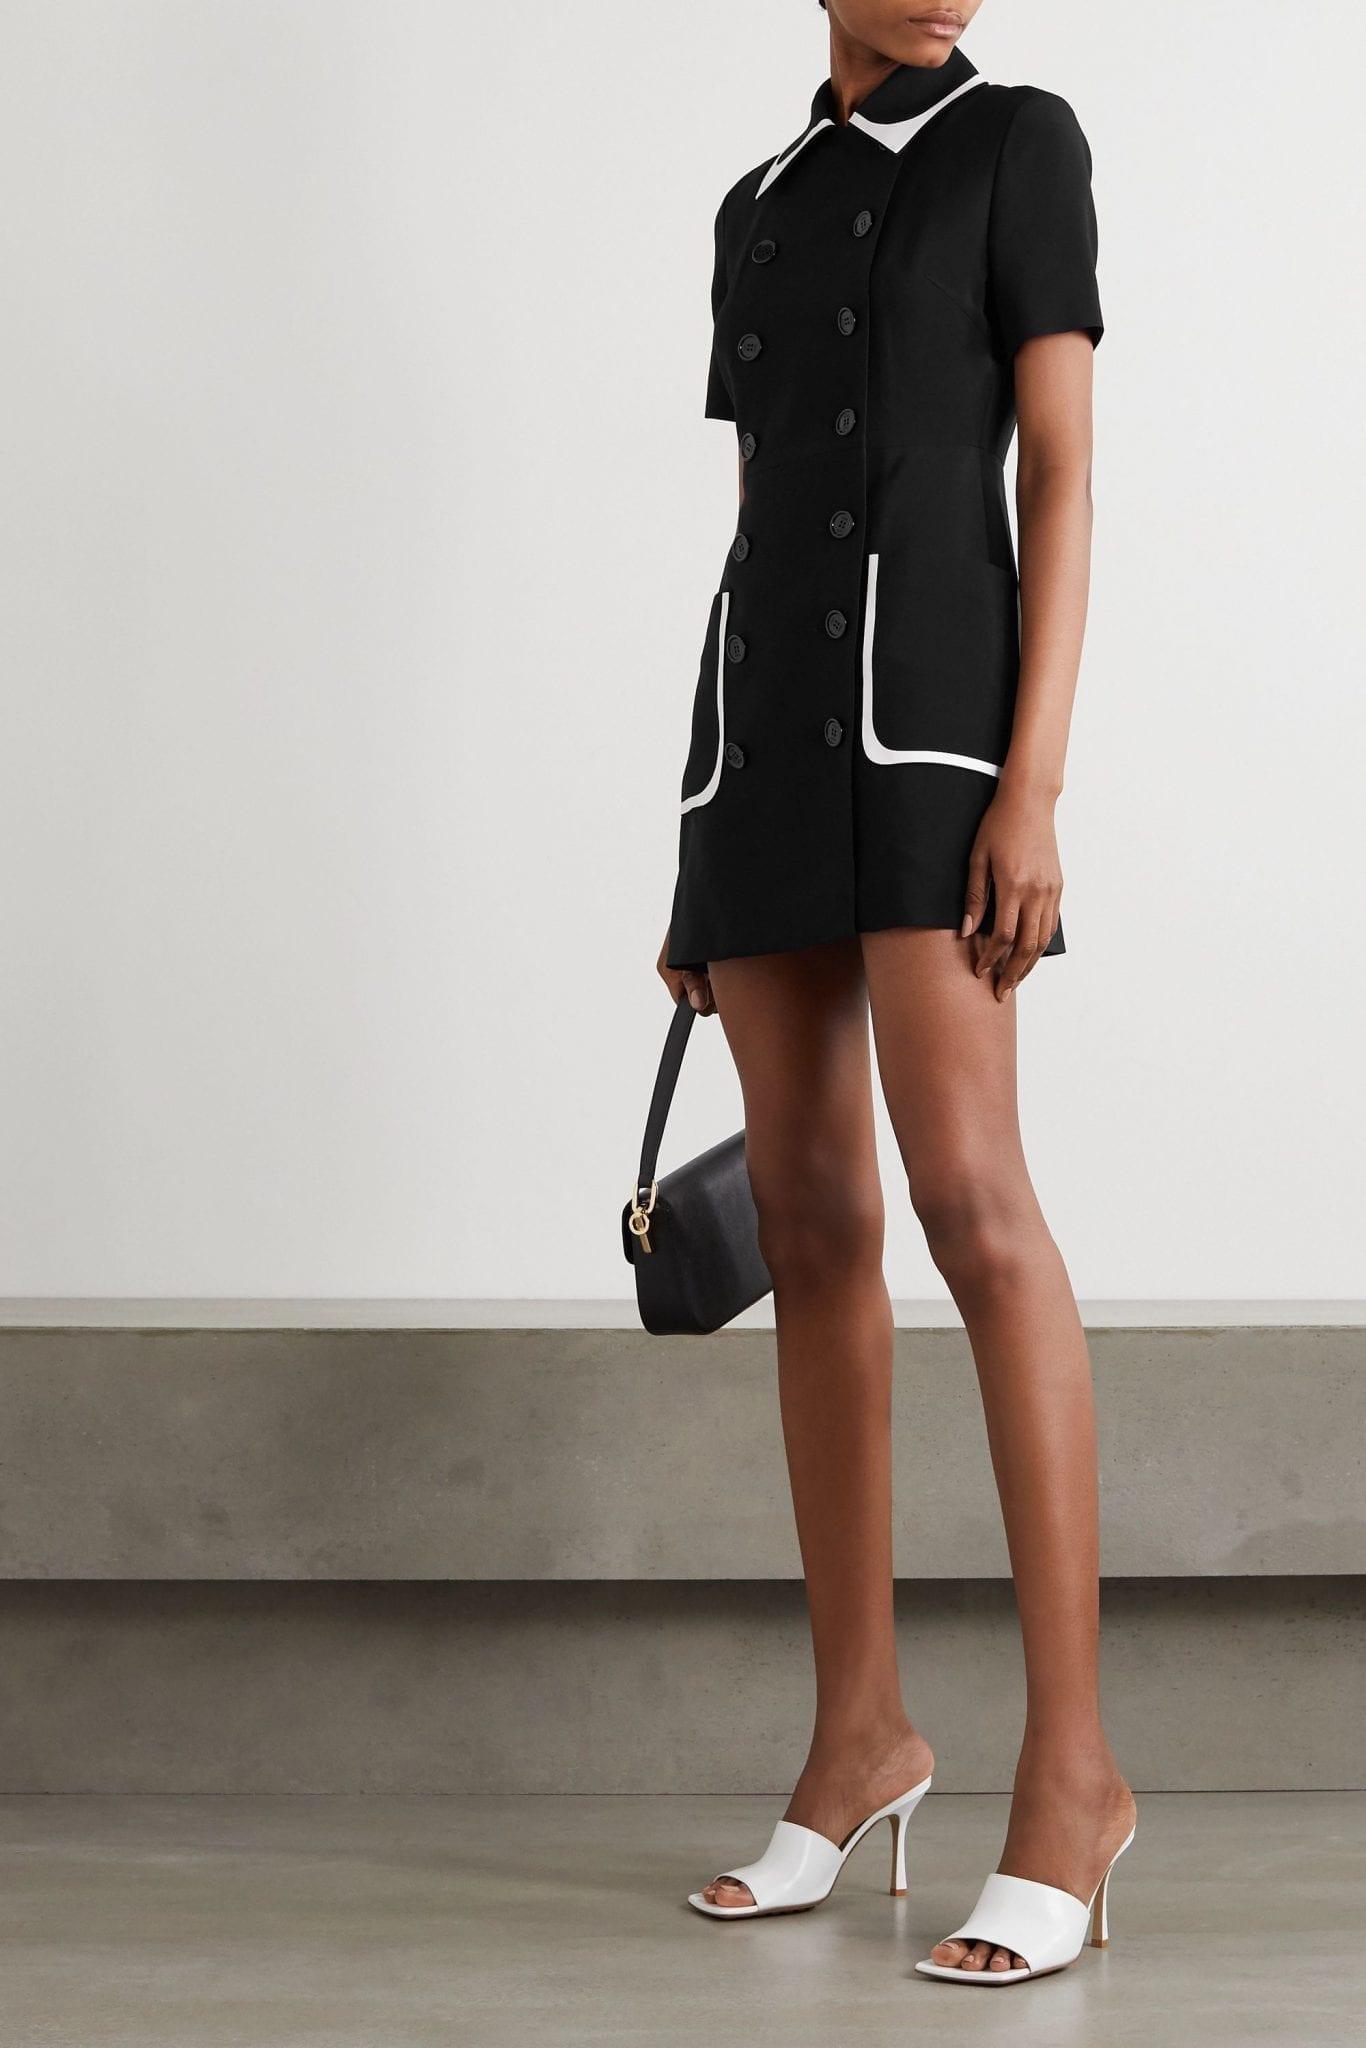 FENDI Double-breasted Two-tone Crepe Mini Dress